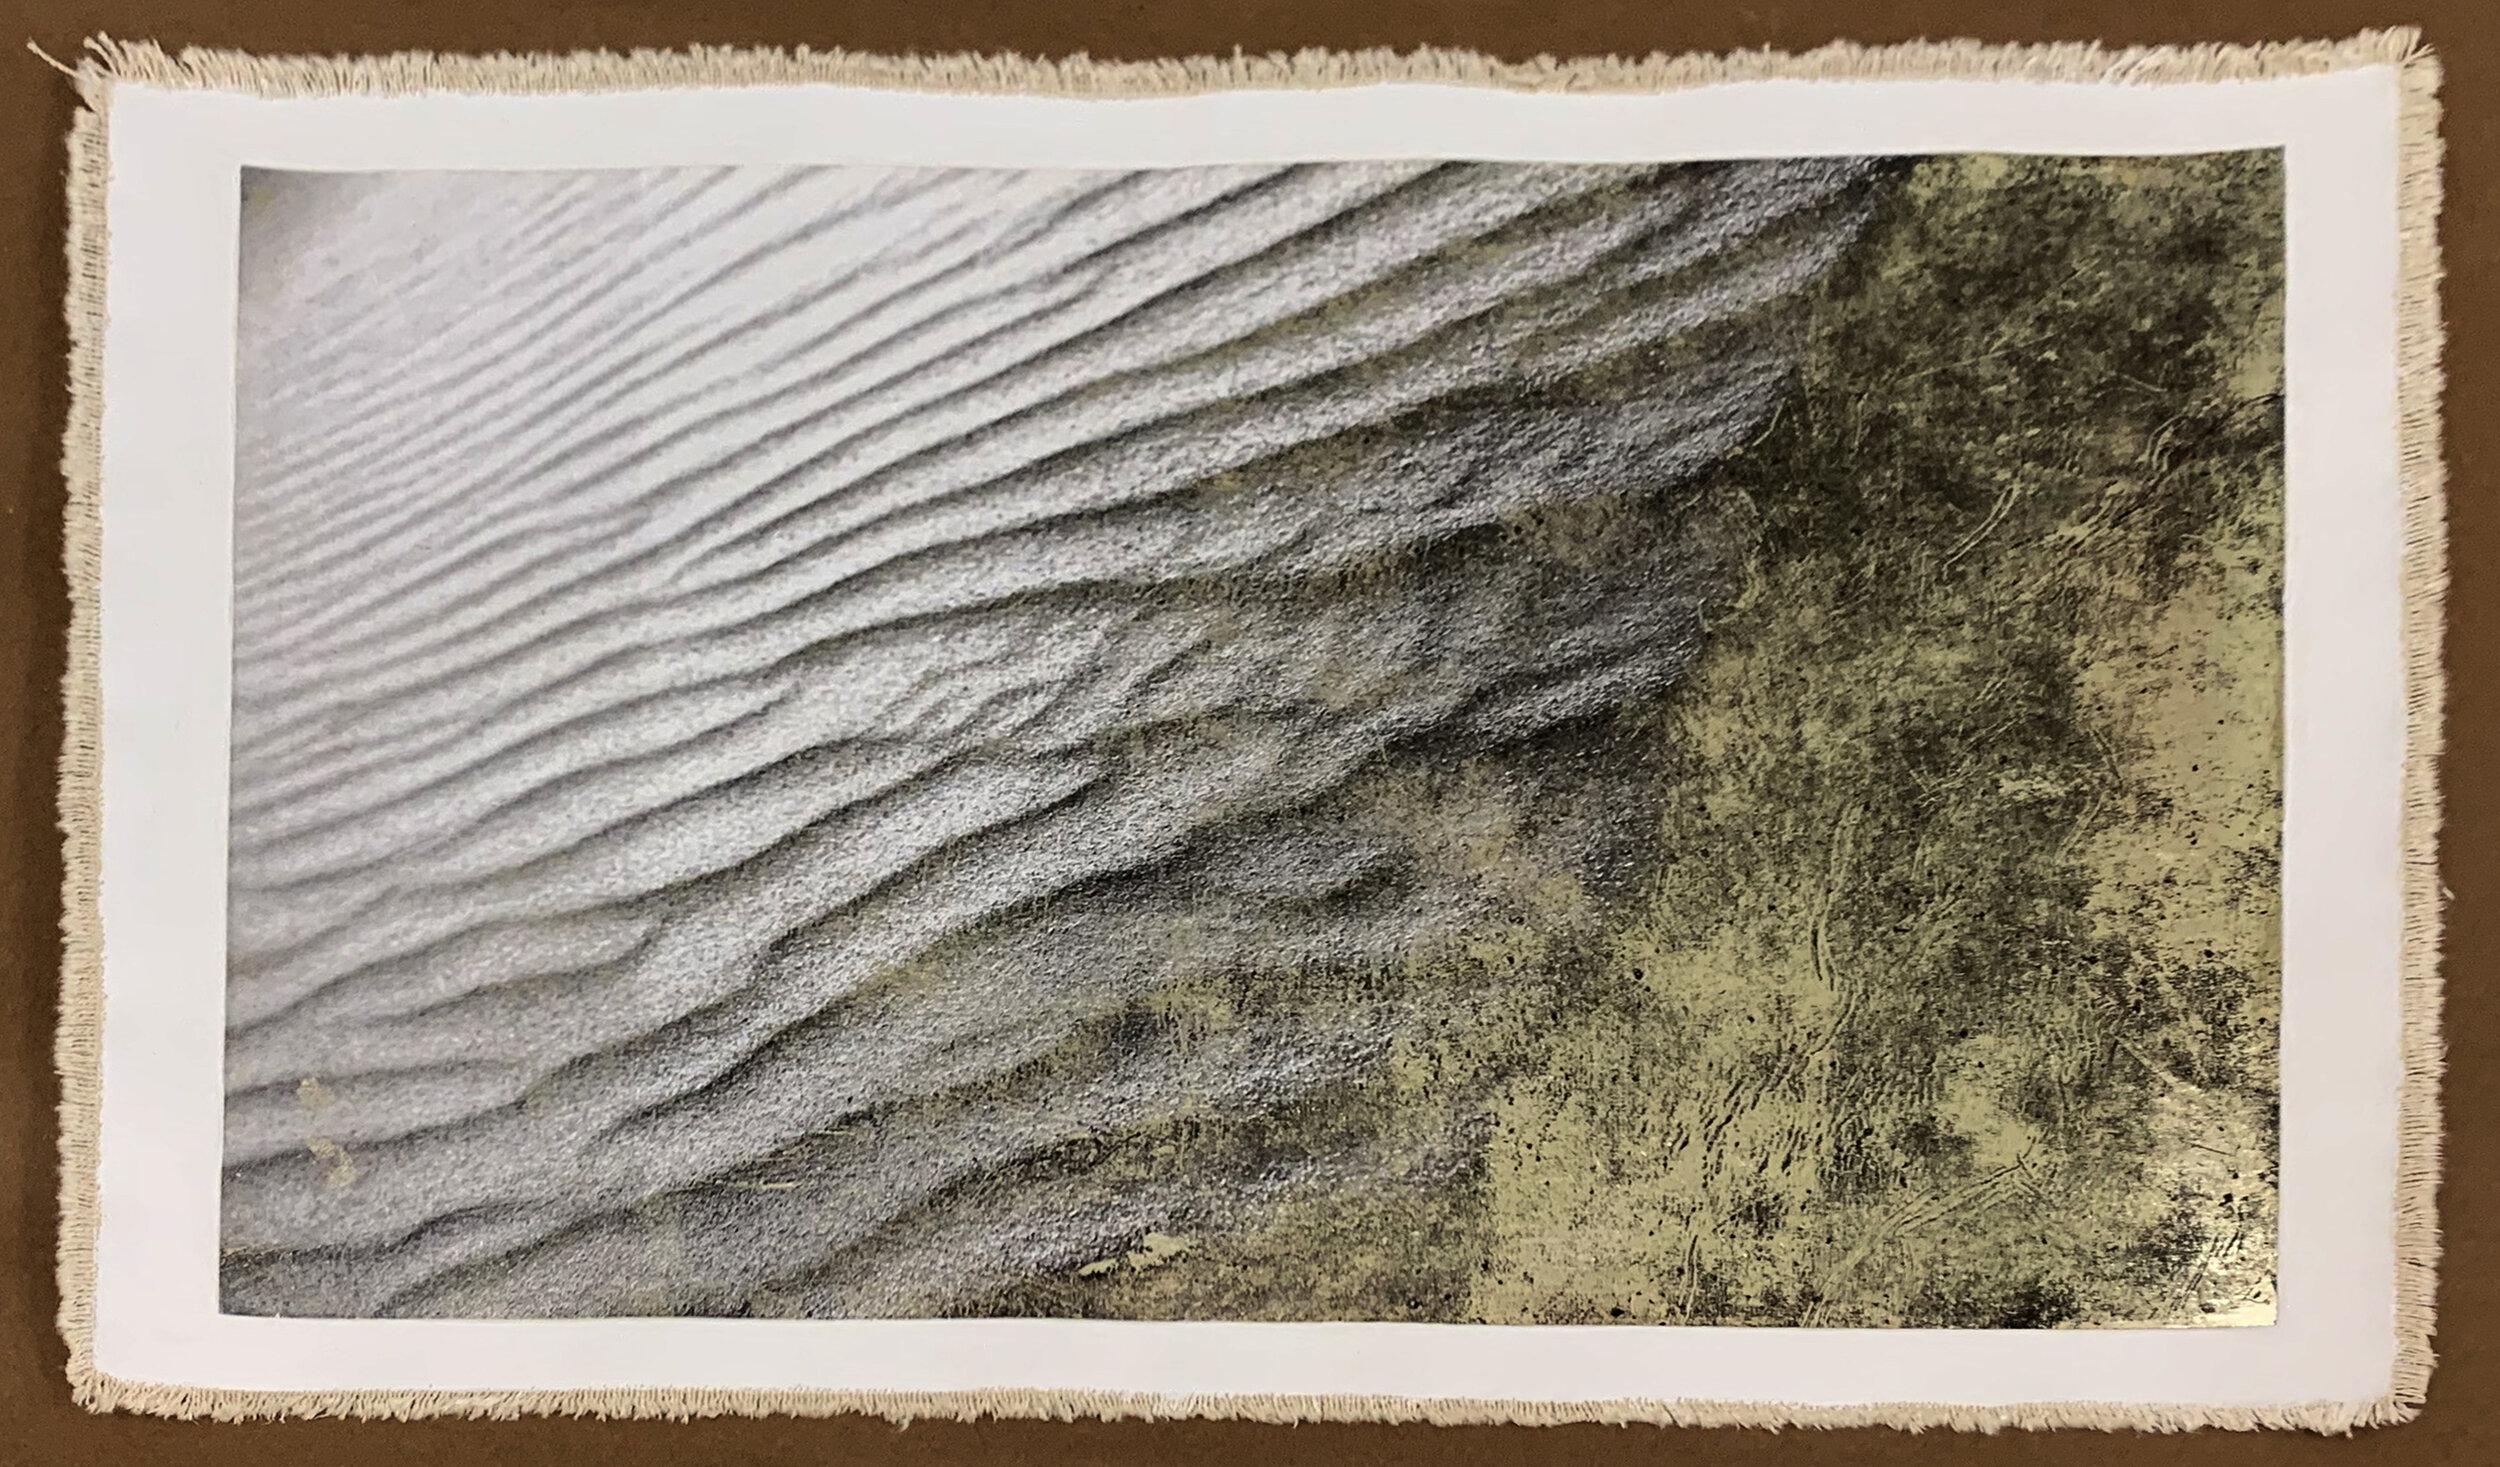 Egyptian Dunes VII